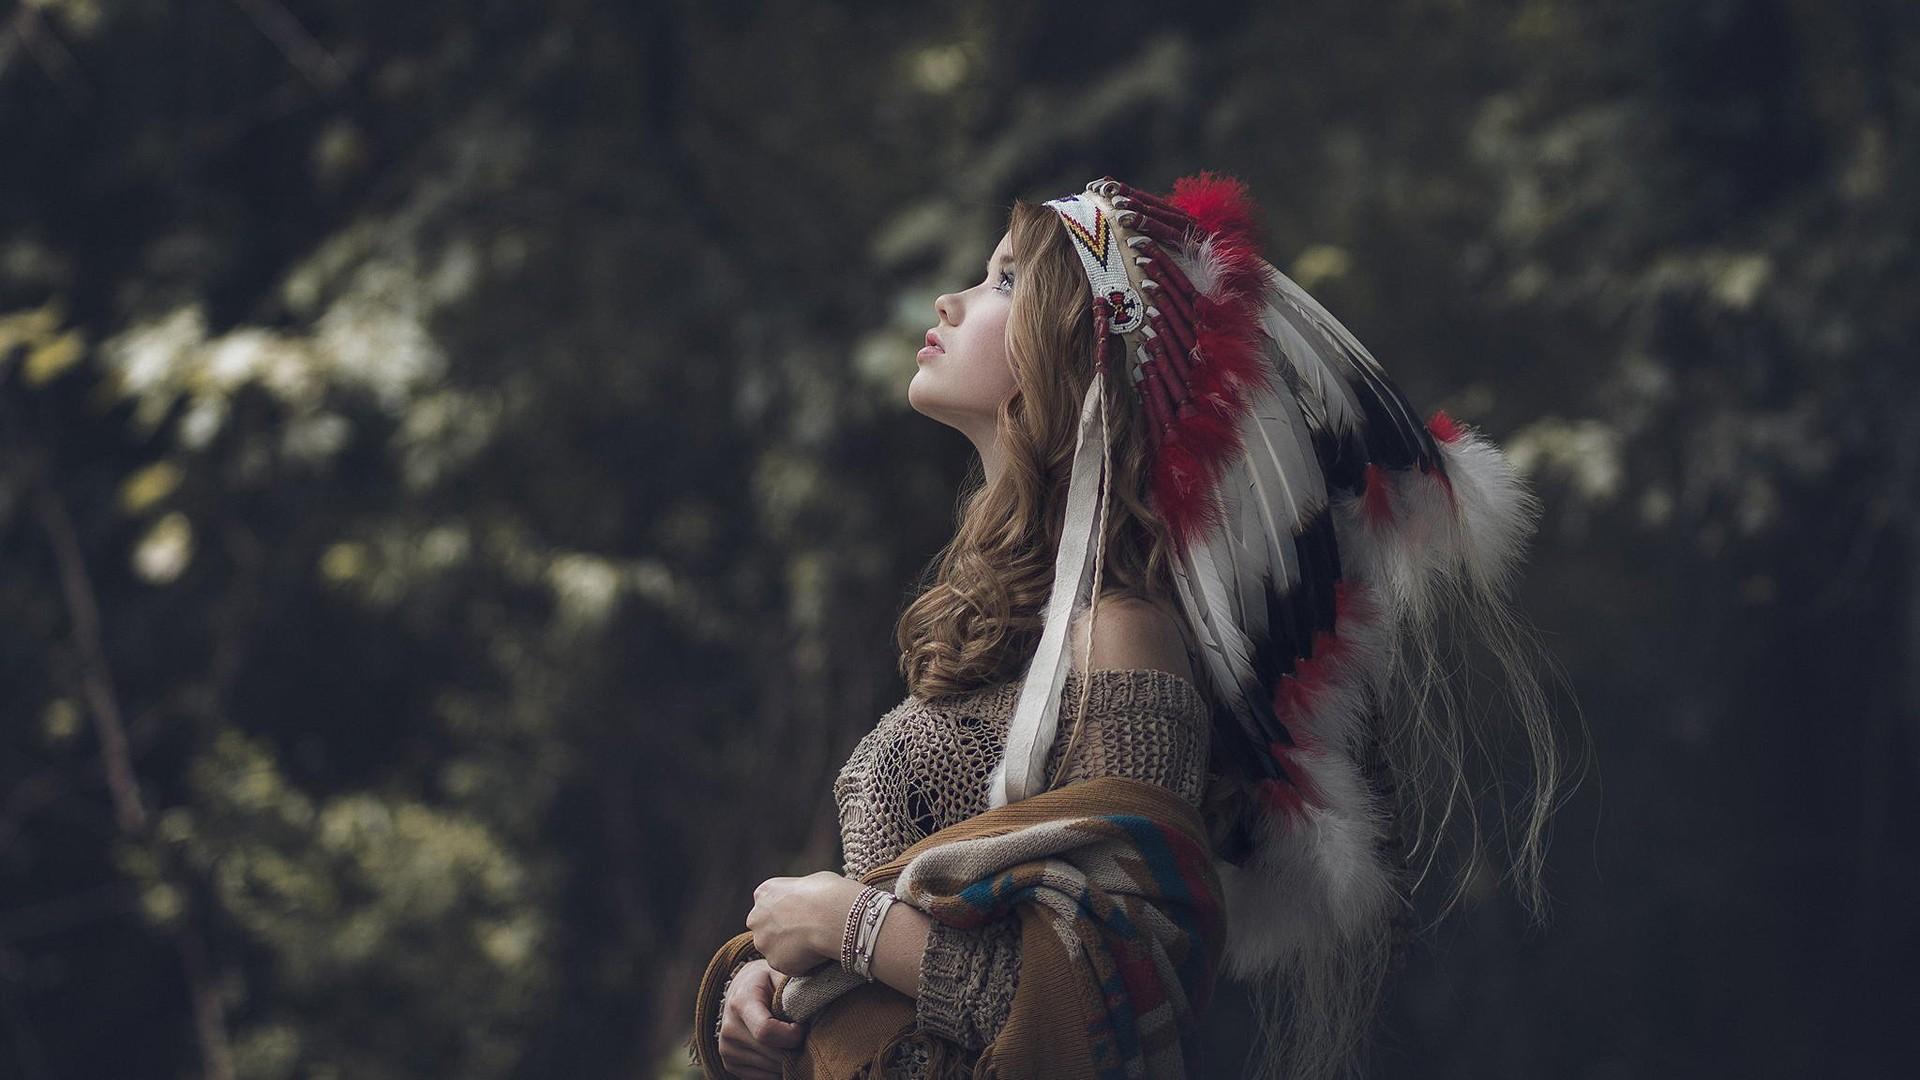 People 1920x1080 women blonde long hair profile looking into the distance bokeh women outdoors sacrilege outdoors looking up bracelets Native American clothing headdress Abigail Kasyanyuk